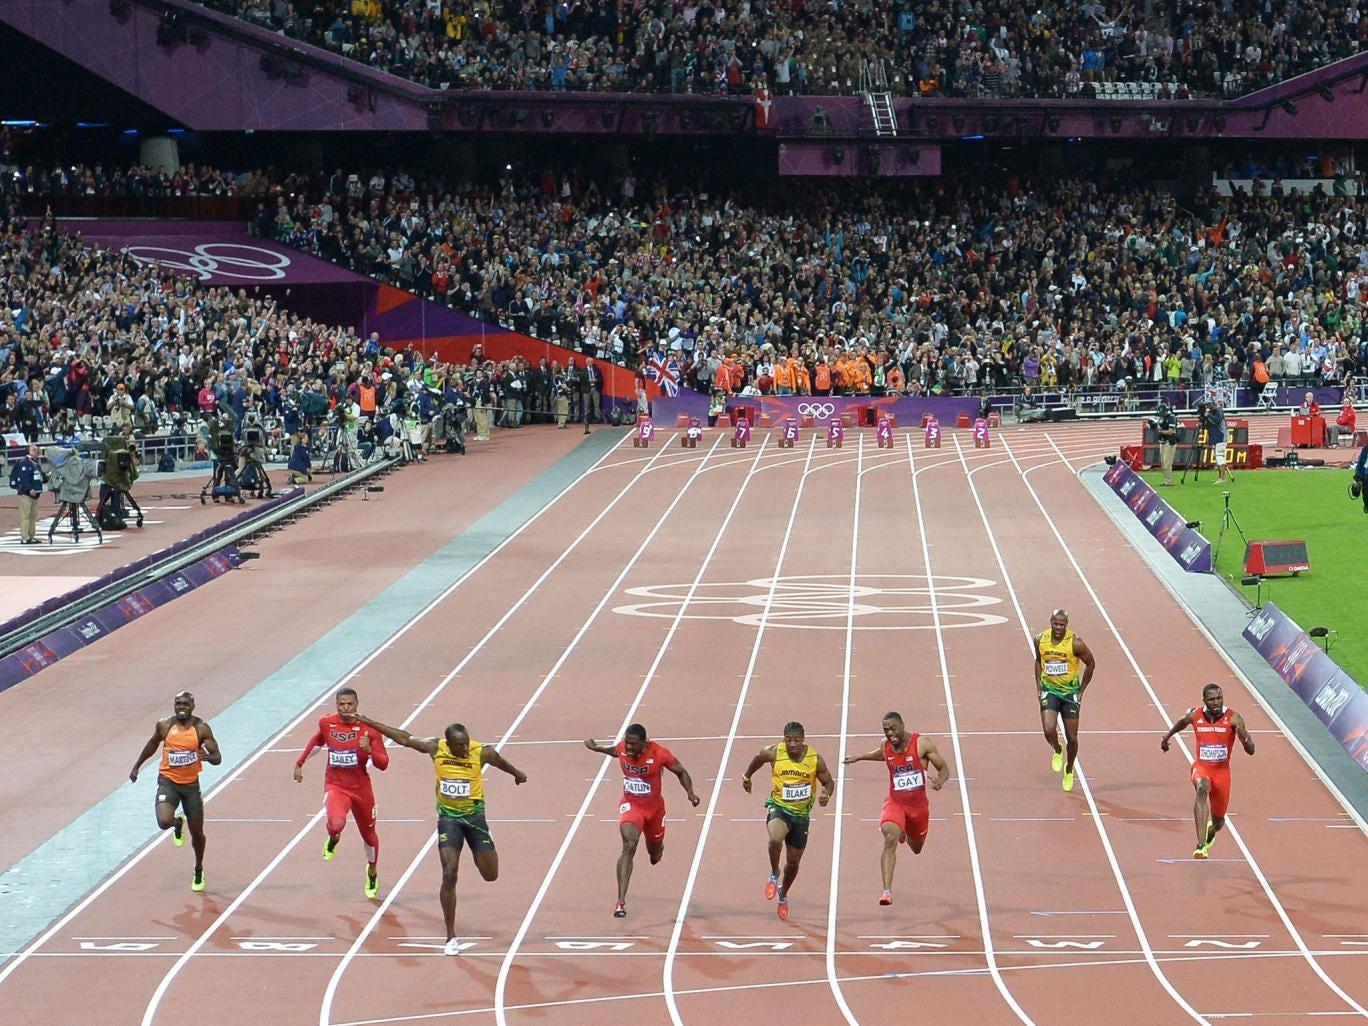 Usain Bolt wins his 100m gold at London 2012